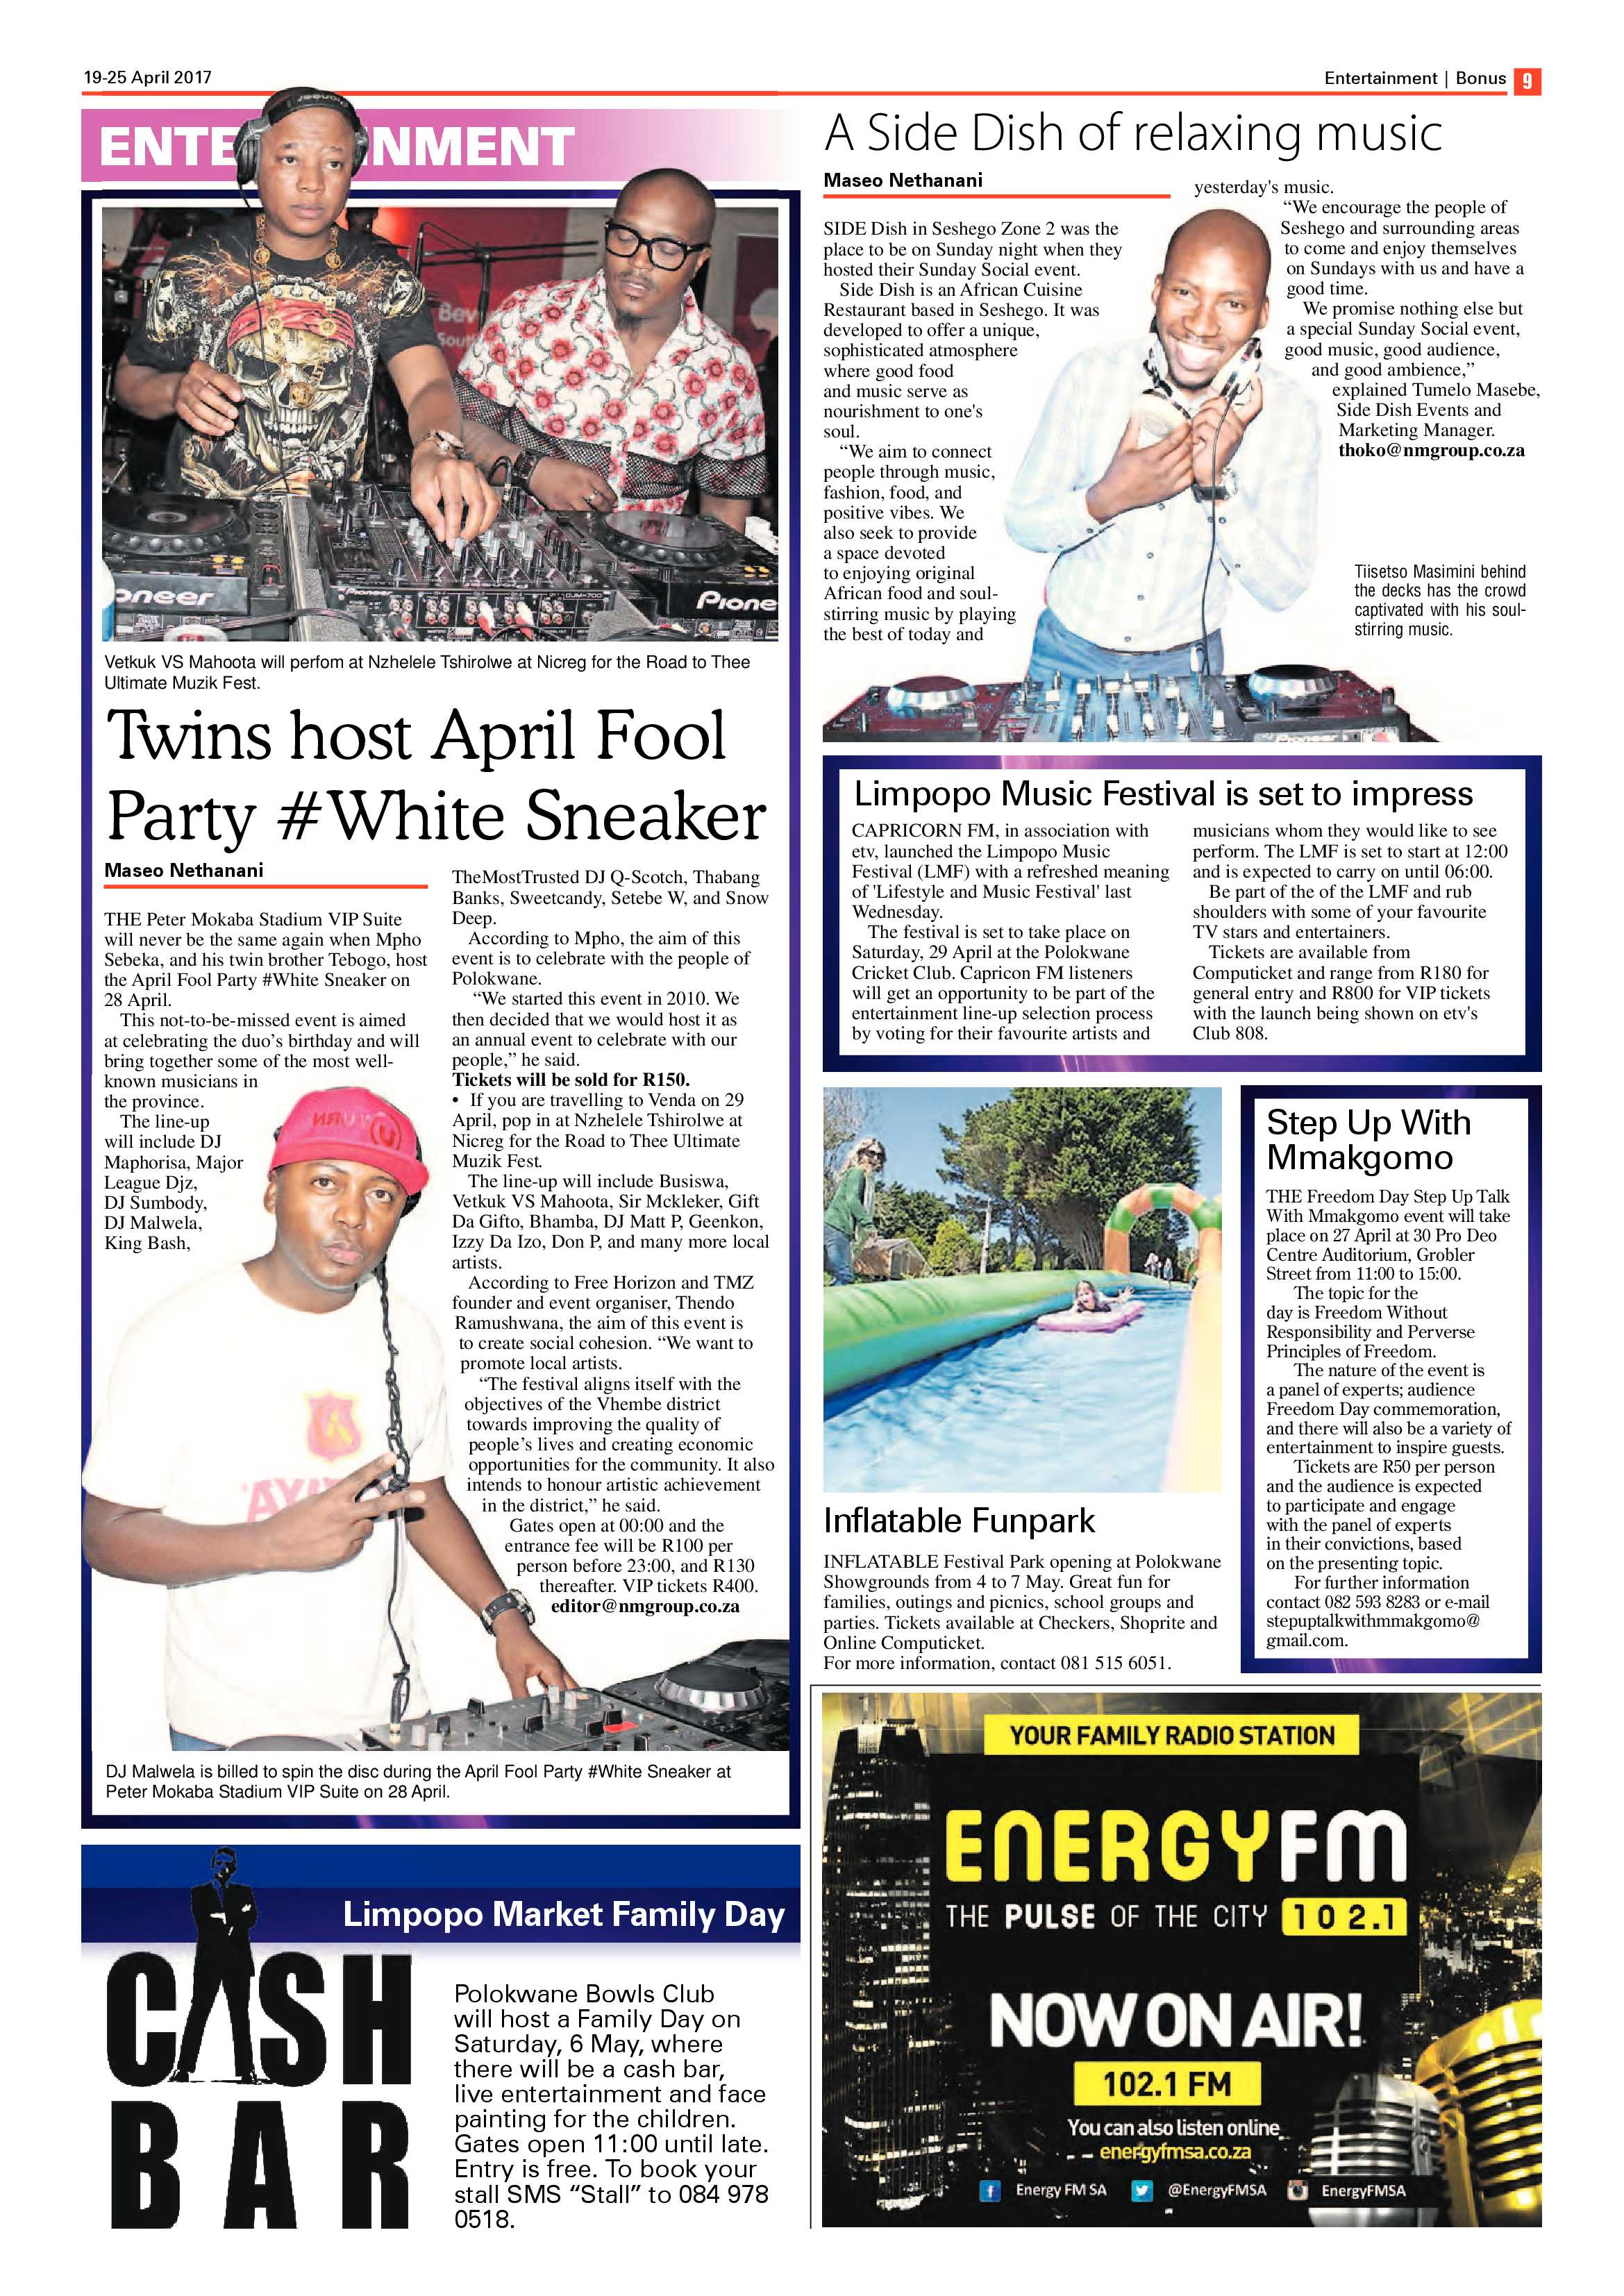 bonus-review-19-april-2017-epapers-page-9